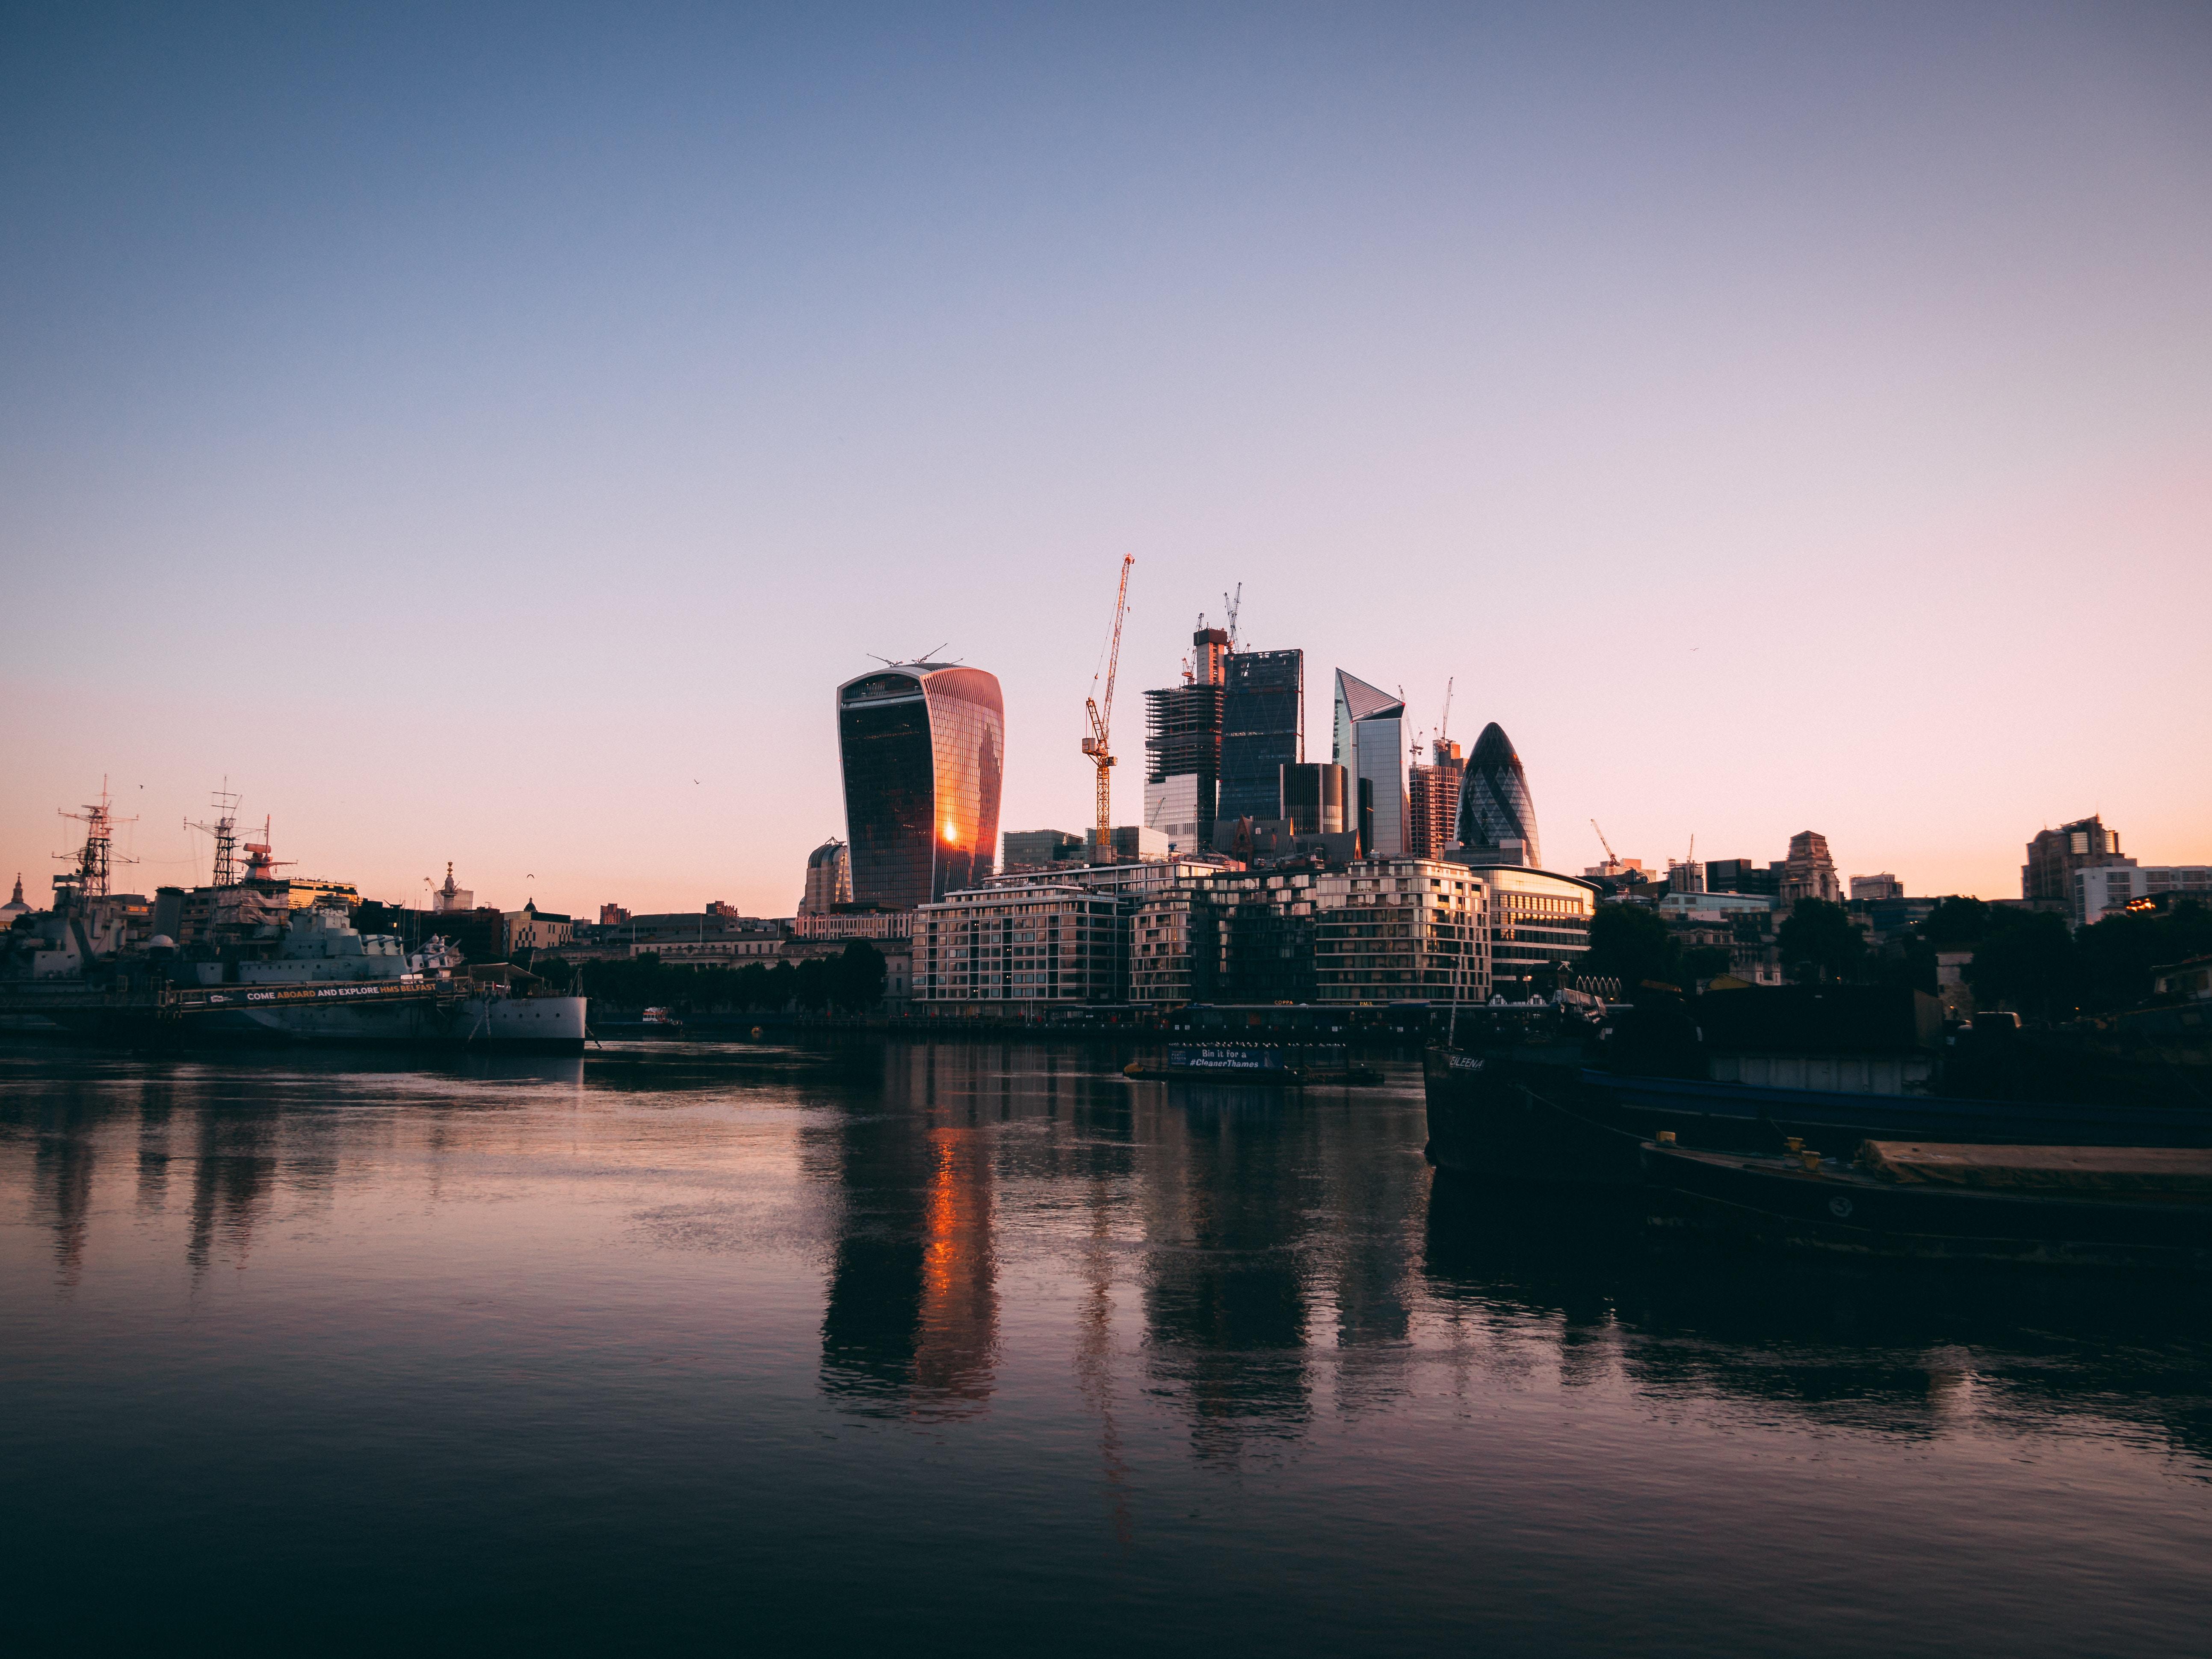 City di Londra vista dal tamigi al tramonto